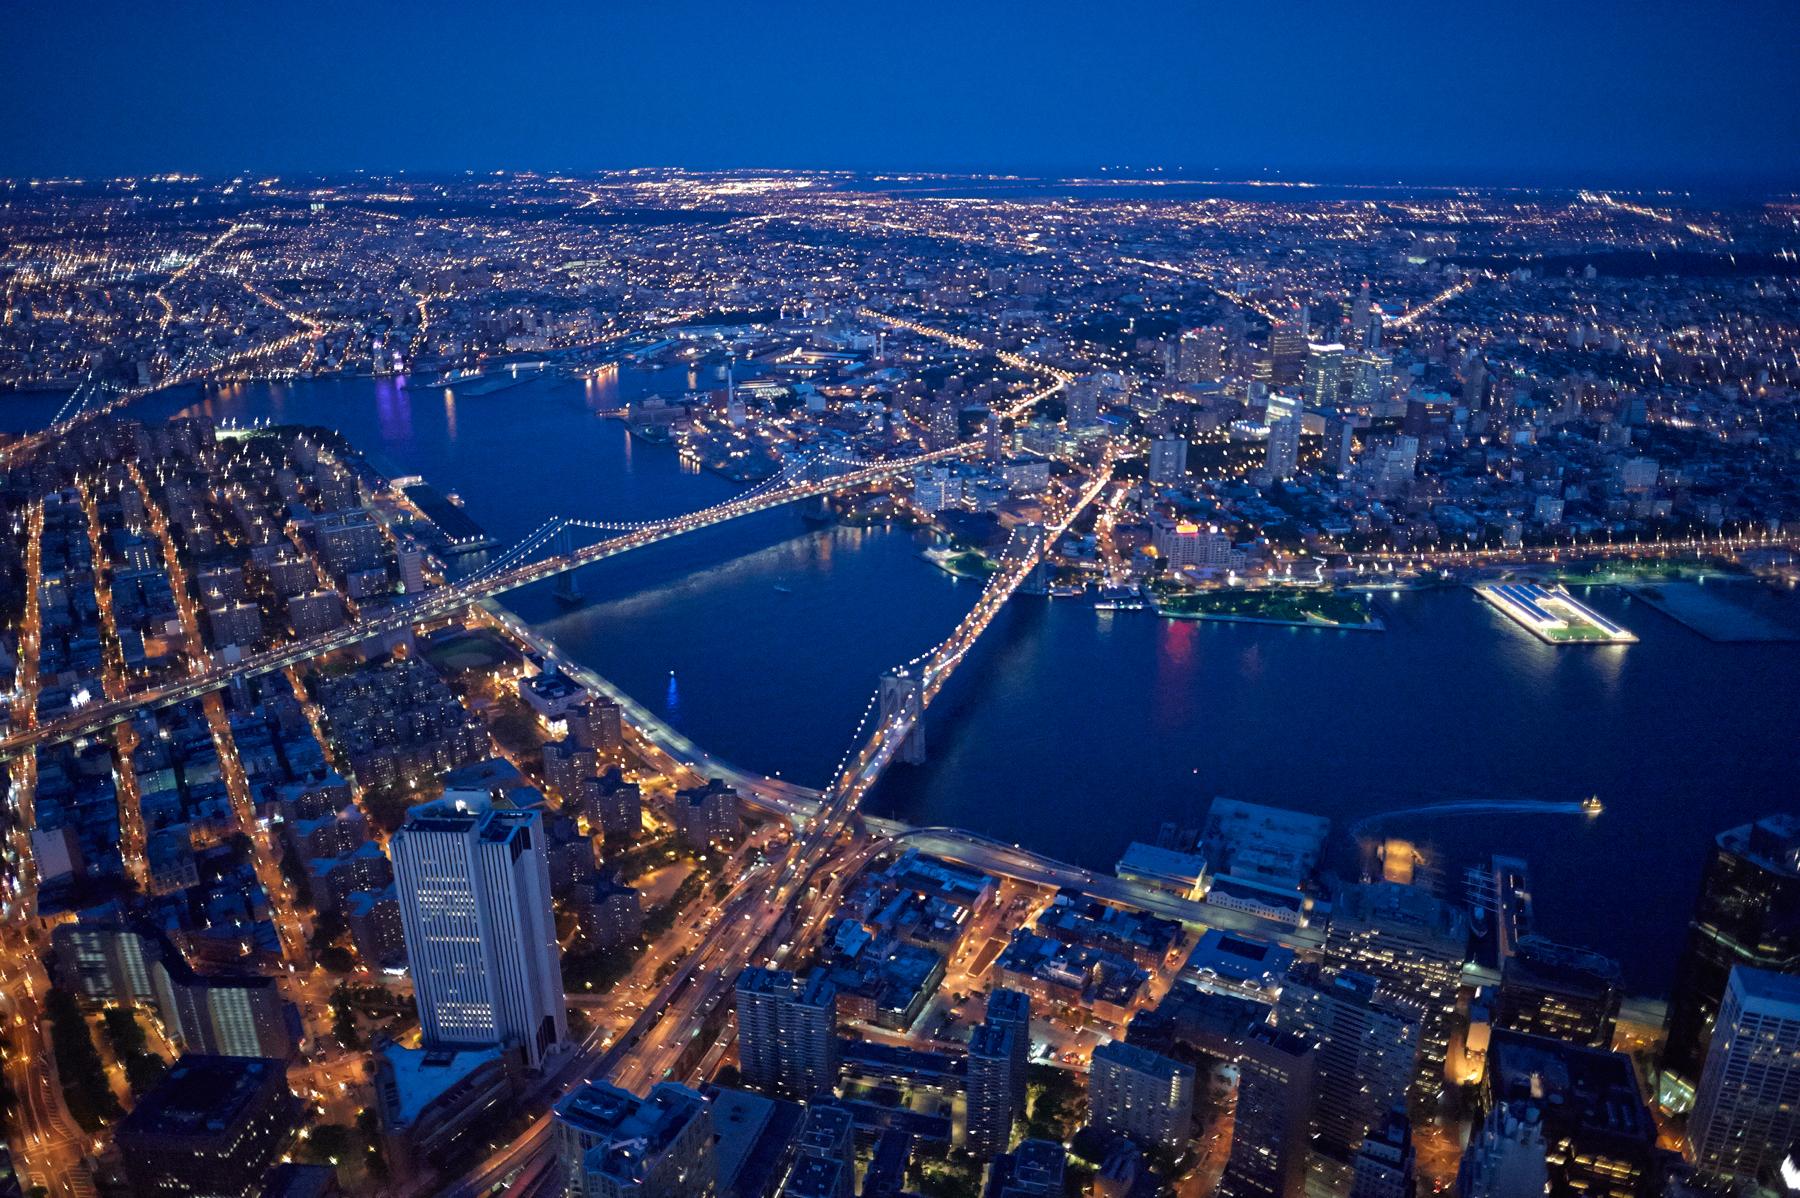 The Daily Edit  Cameron Davidson  New York City Aerials  A Photo Editor